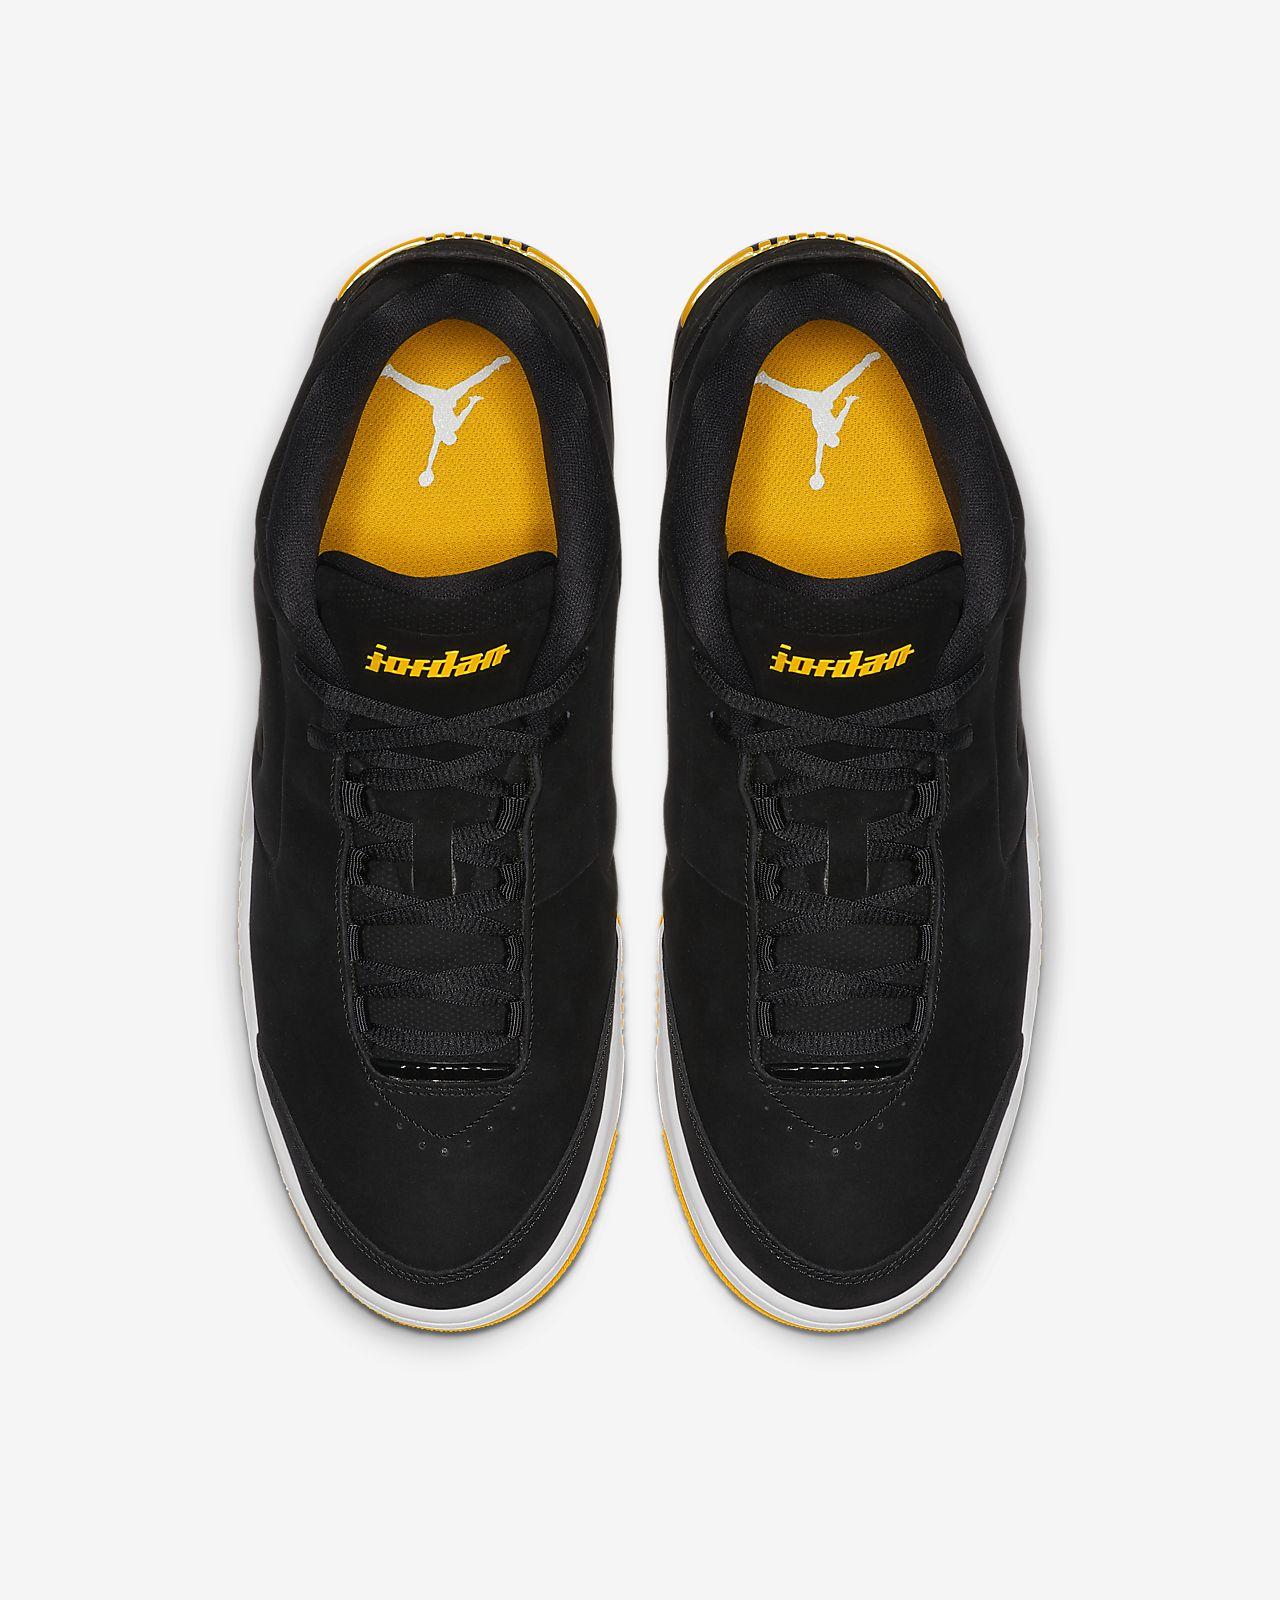 Pour Big Chaussure Fund Homme Jordan b7gyYf6